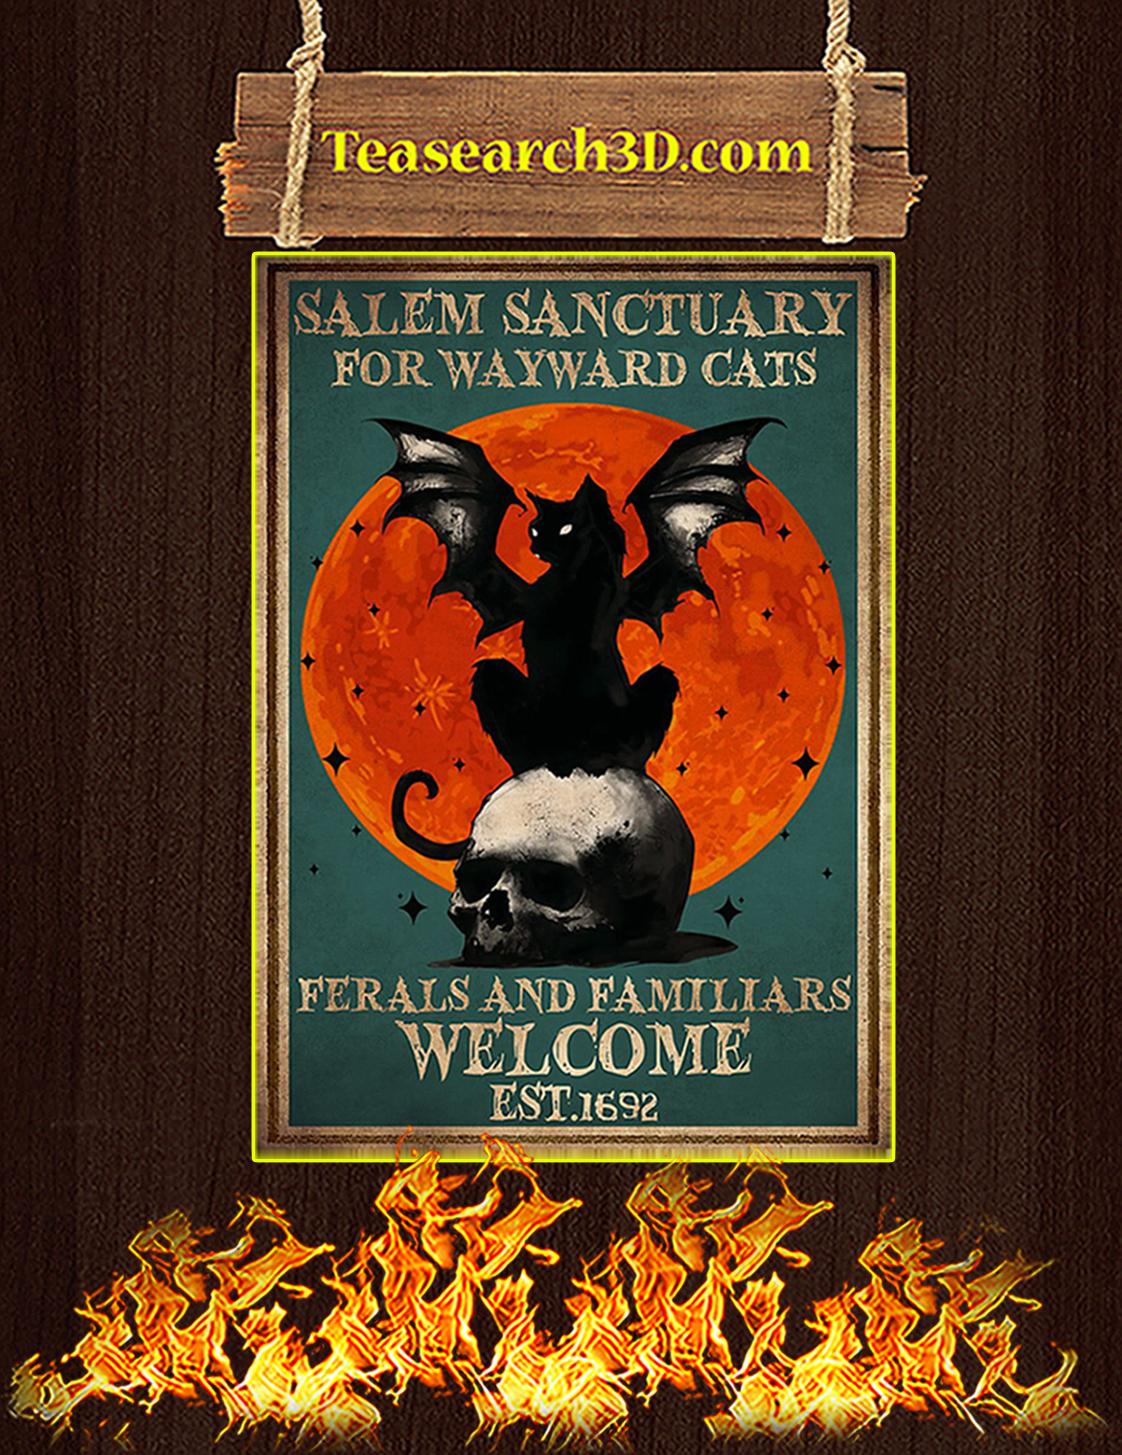 Salem sanctuary for wayward cats poster A3